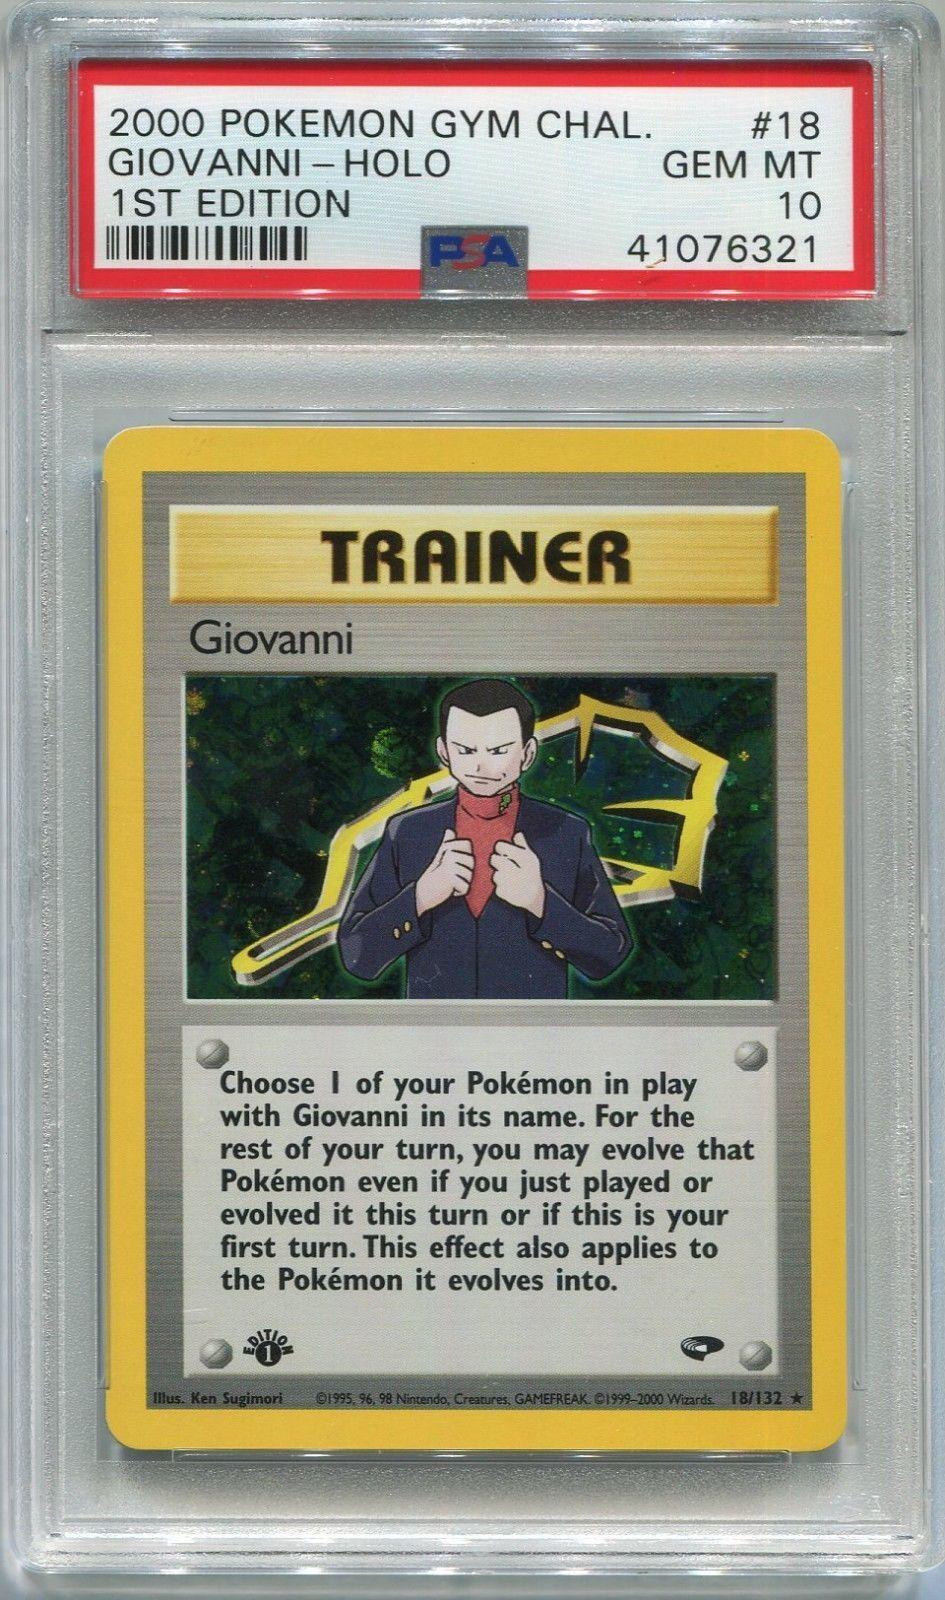 pokemon card 1st edition giovanni holo gym challenge 18